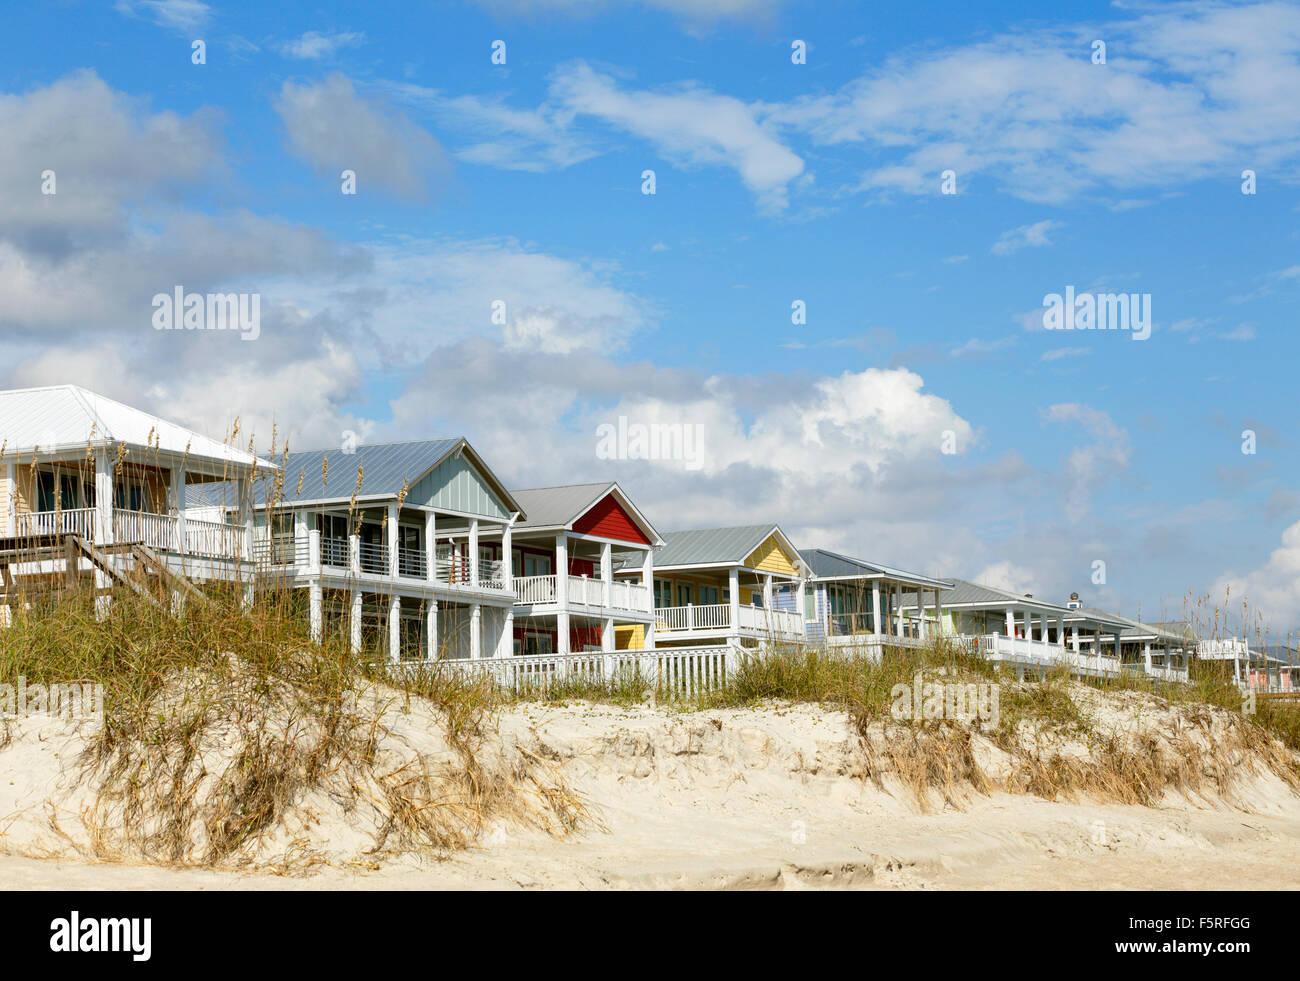 beach-houses-on-kure-beach-near-wilmington-north-carolina-F5RFGG.jpg